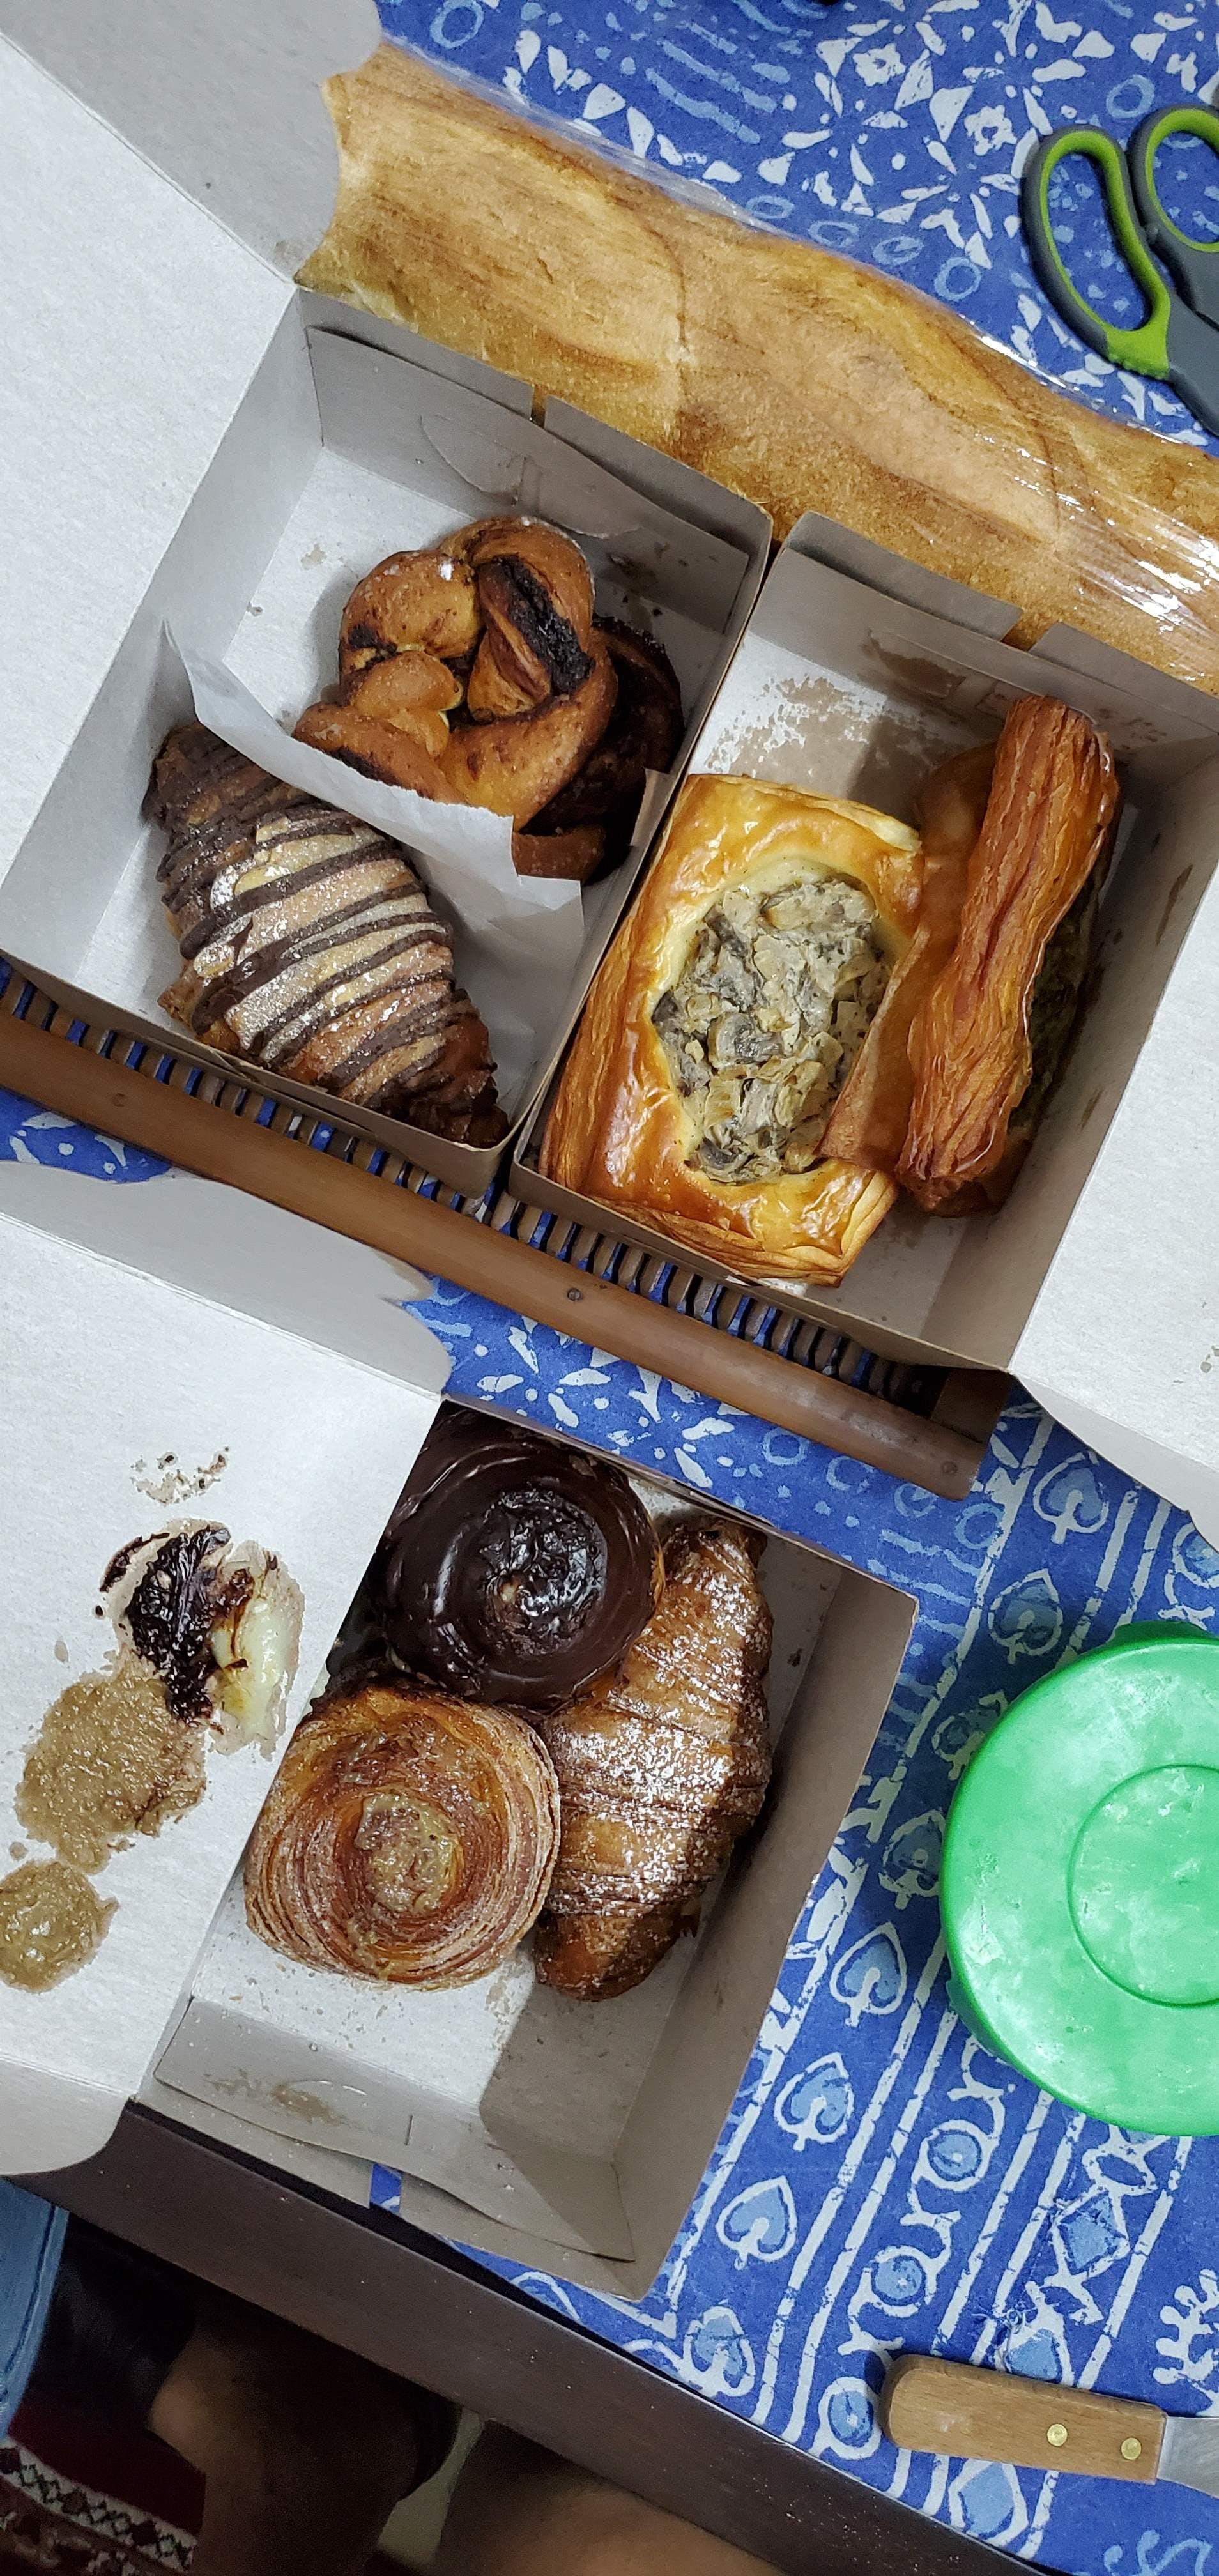 Dish,Cuisine,Food,Brunch,Baked goods,Ingredient,Croissant,Danish pastry,Breakfast,Viennoiserie